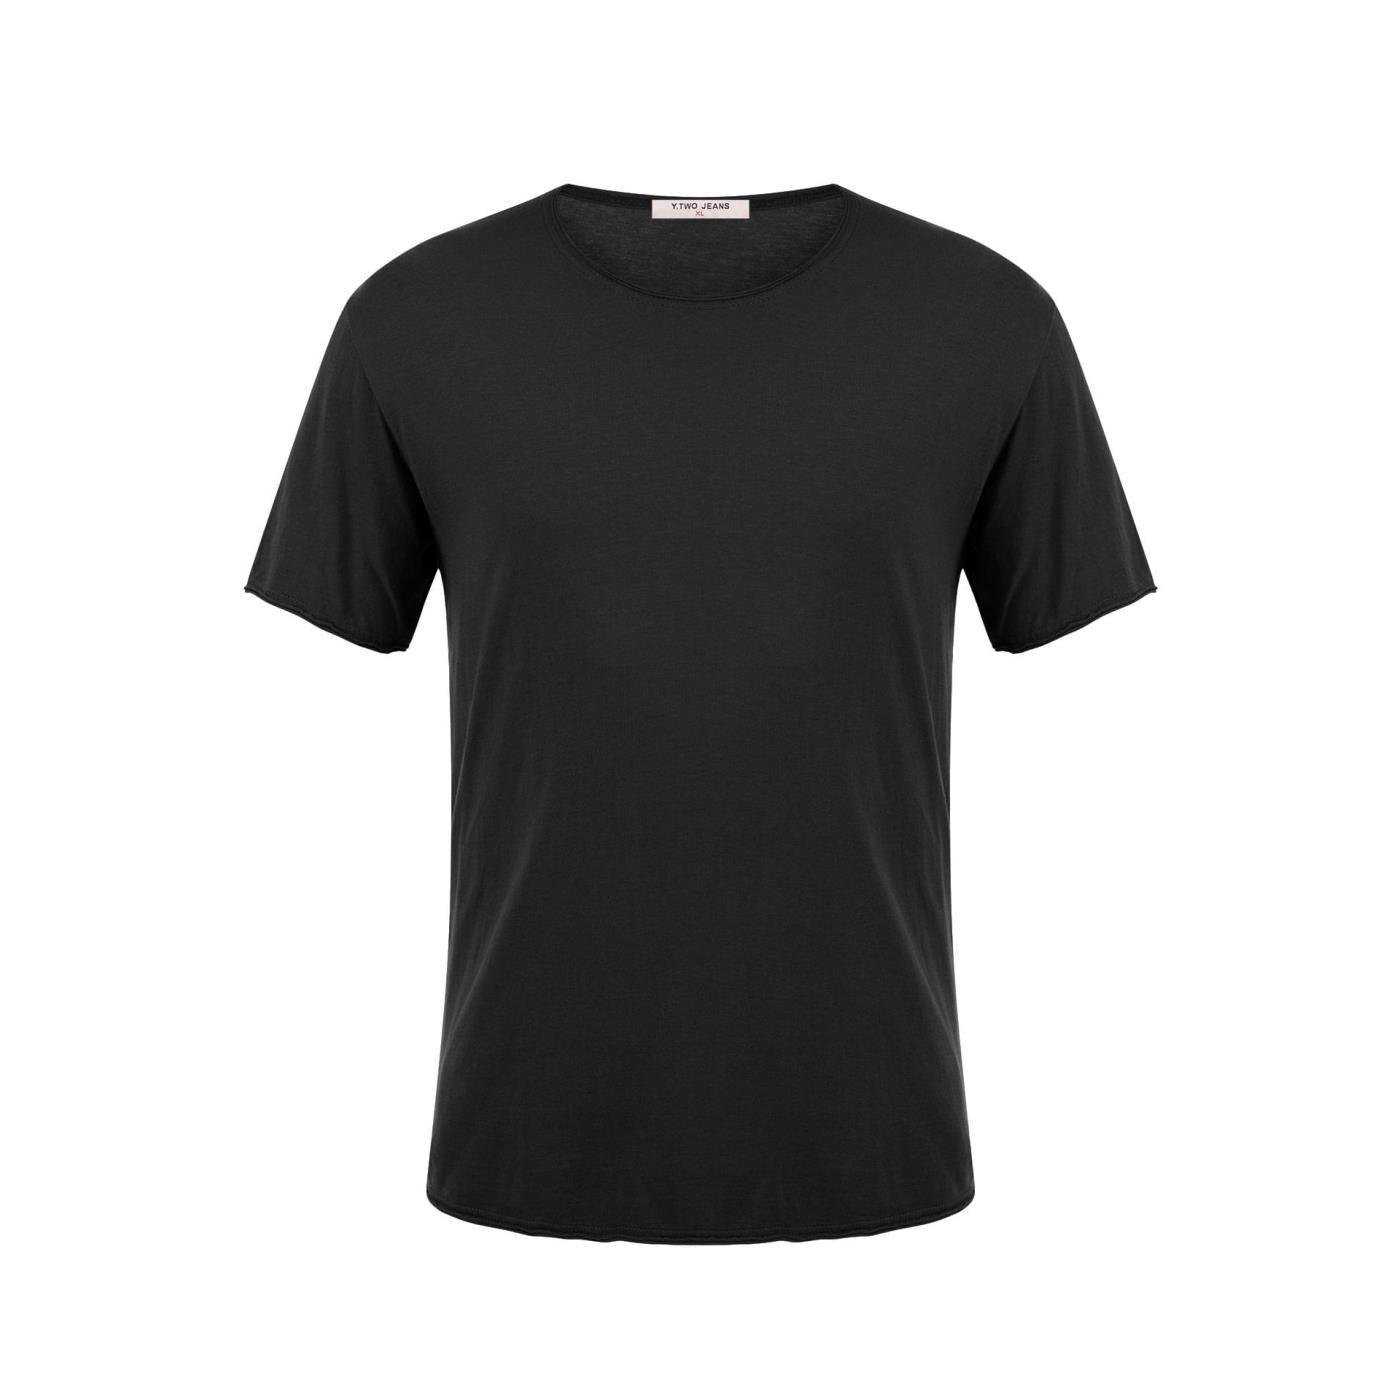 Celestino Ανδρικό T-shirt με αφινίριστο τελείωμα  - Μαυρο - Grootte: Small